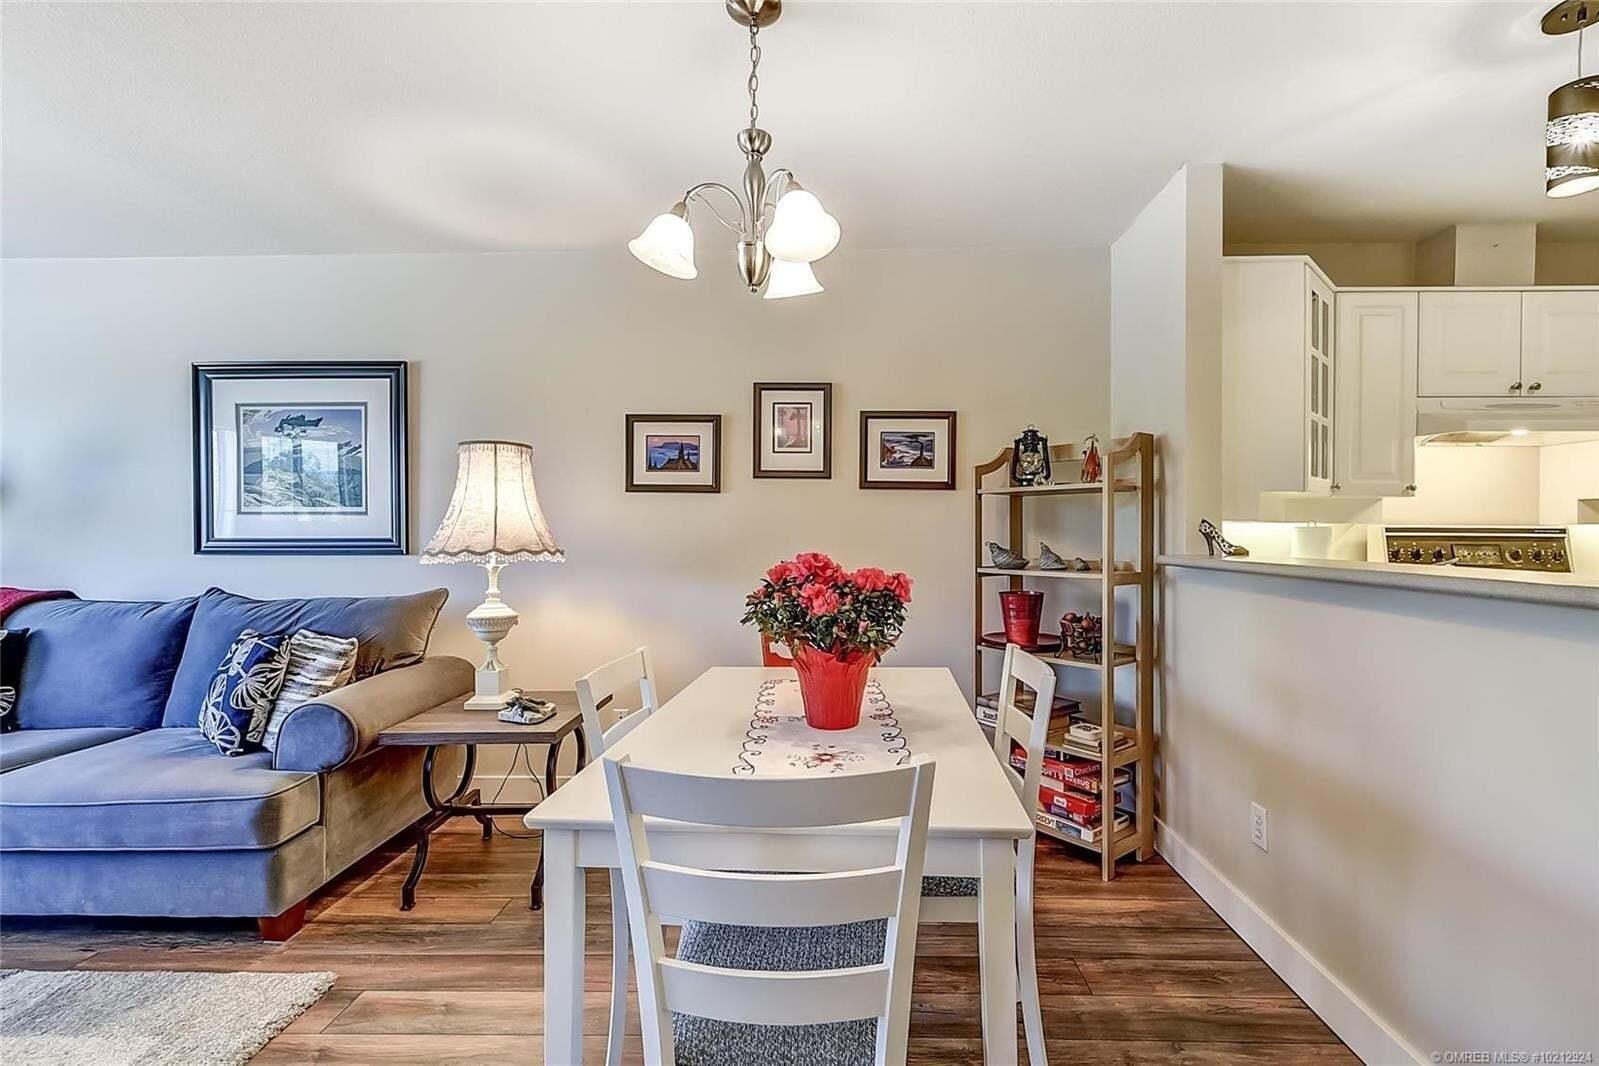 Condo for sale at 3283 Casorso Rd Kelowna British Columbia - MLS: 10212924